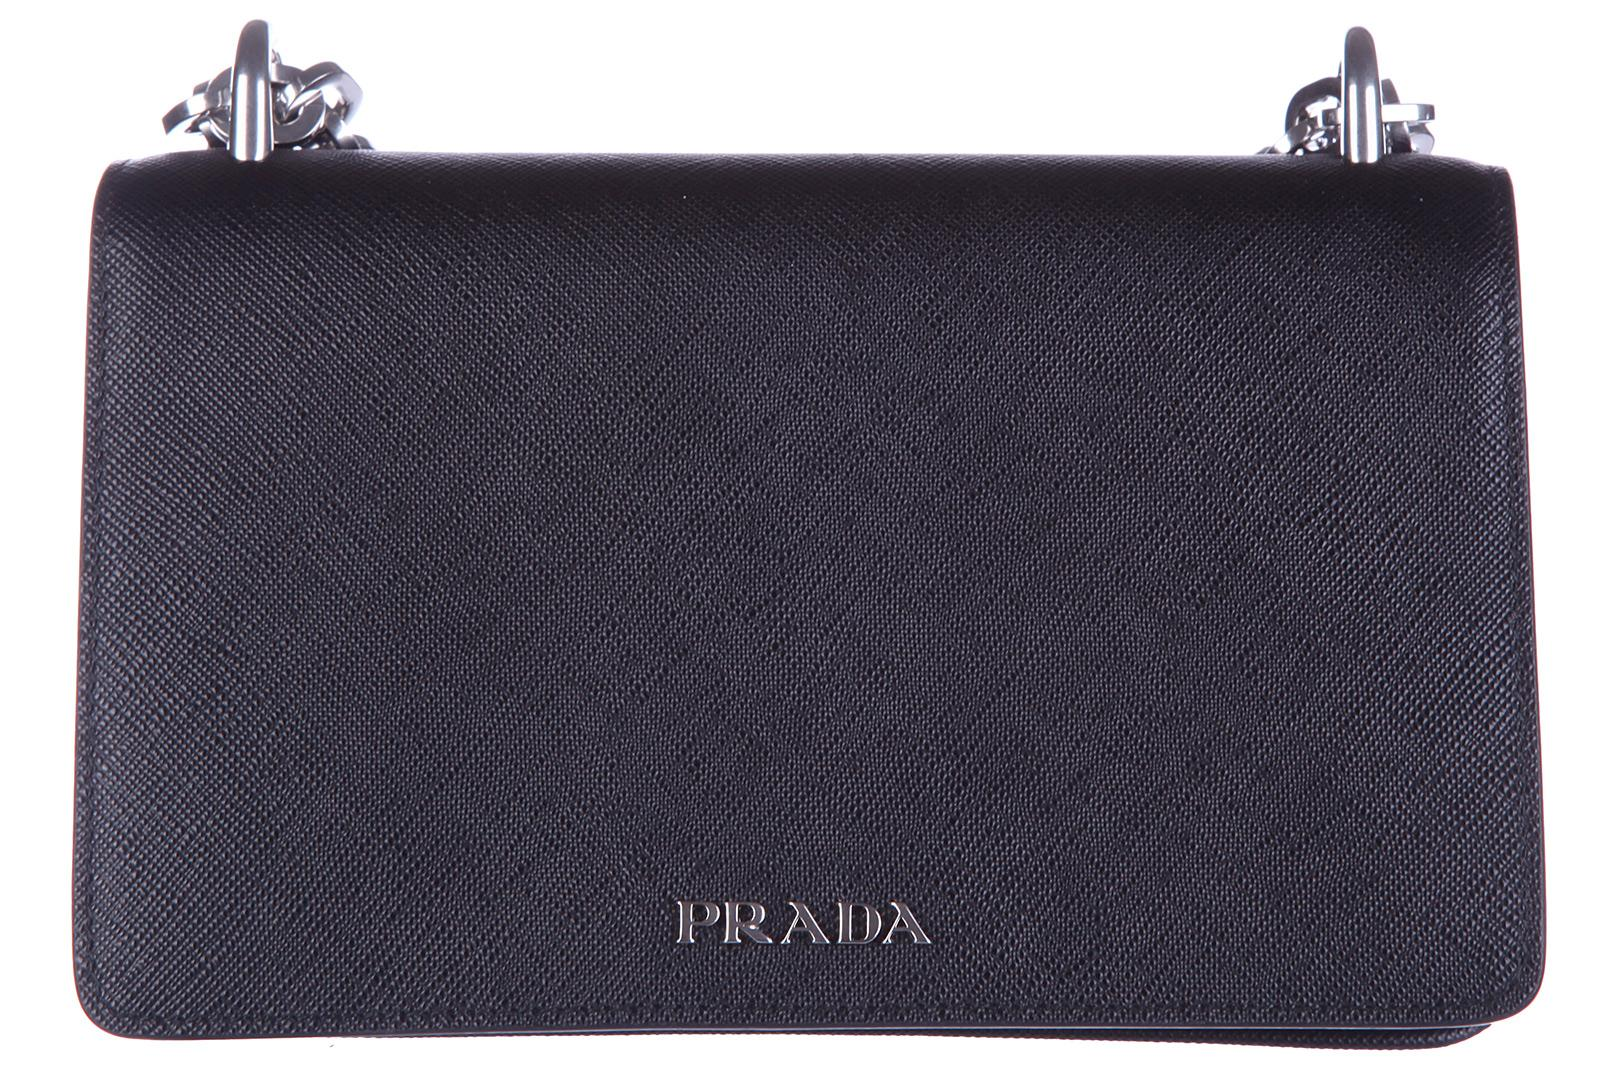 Prada Women's Leather Shoulder Bag In Black